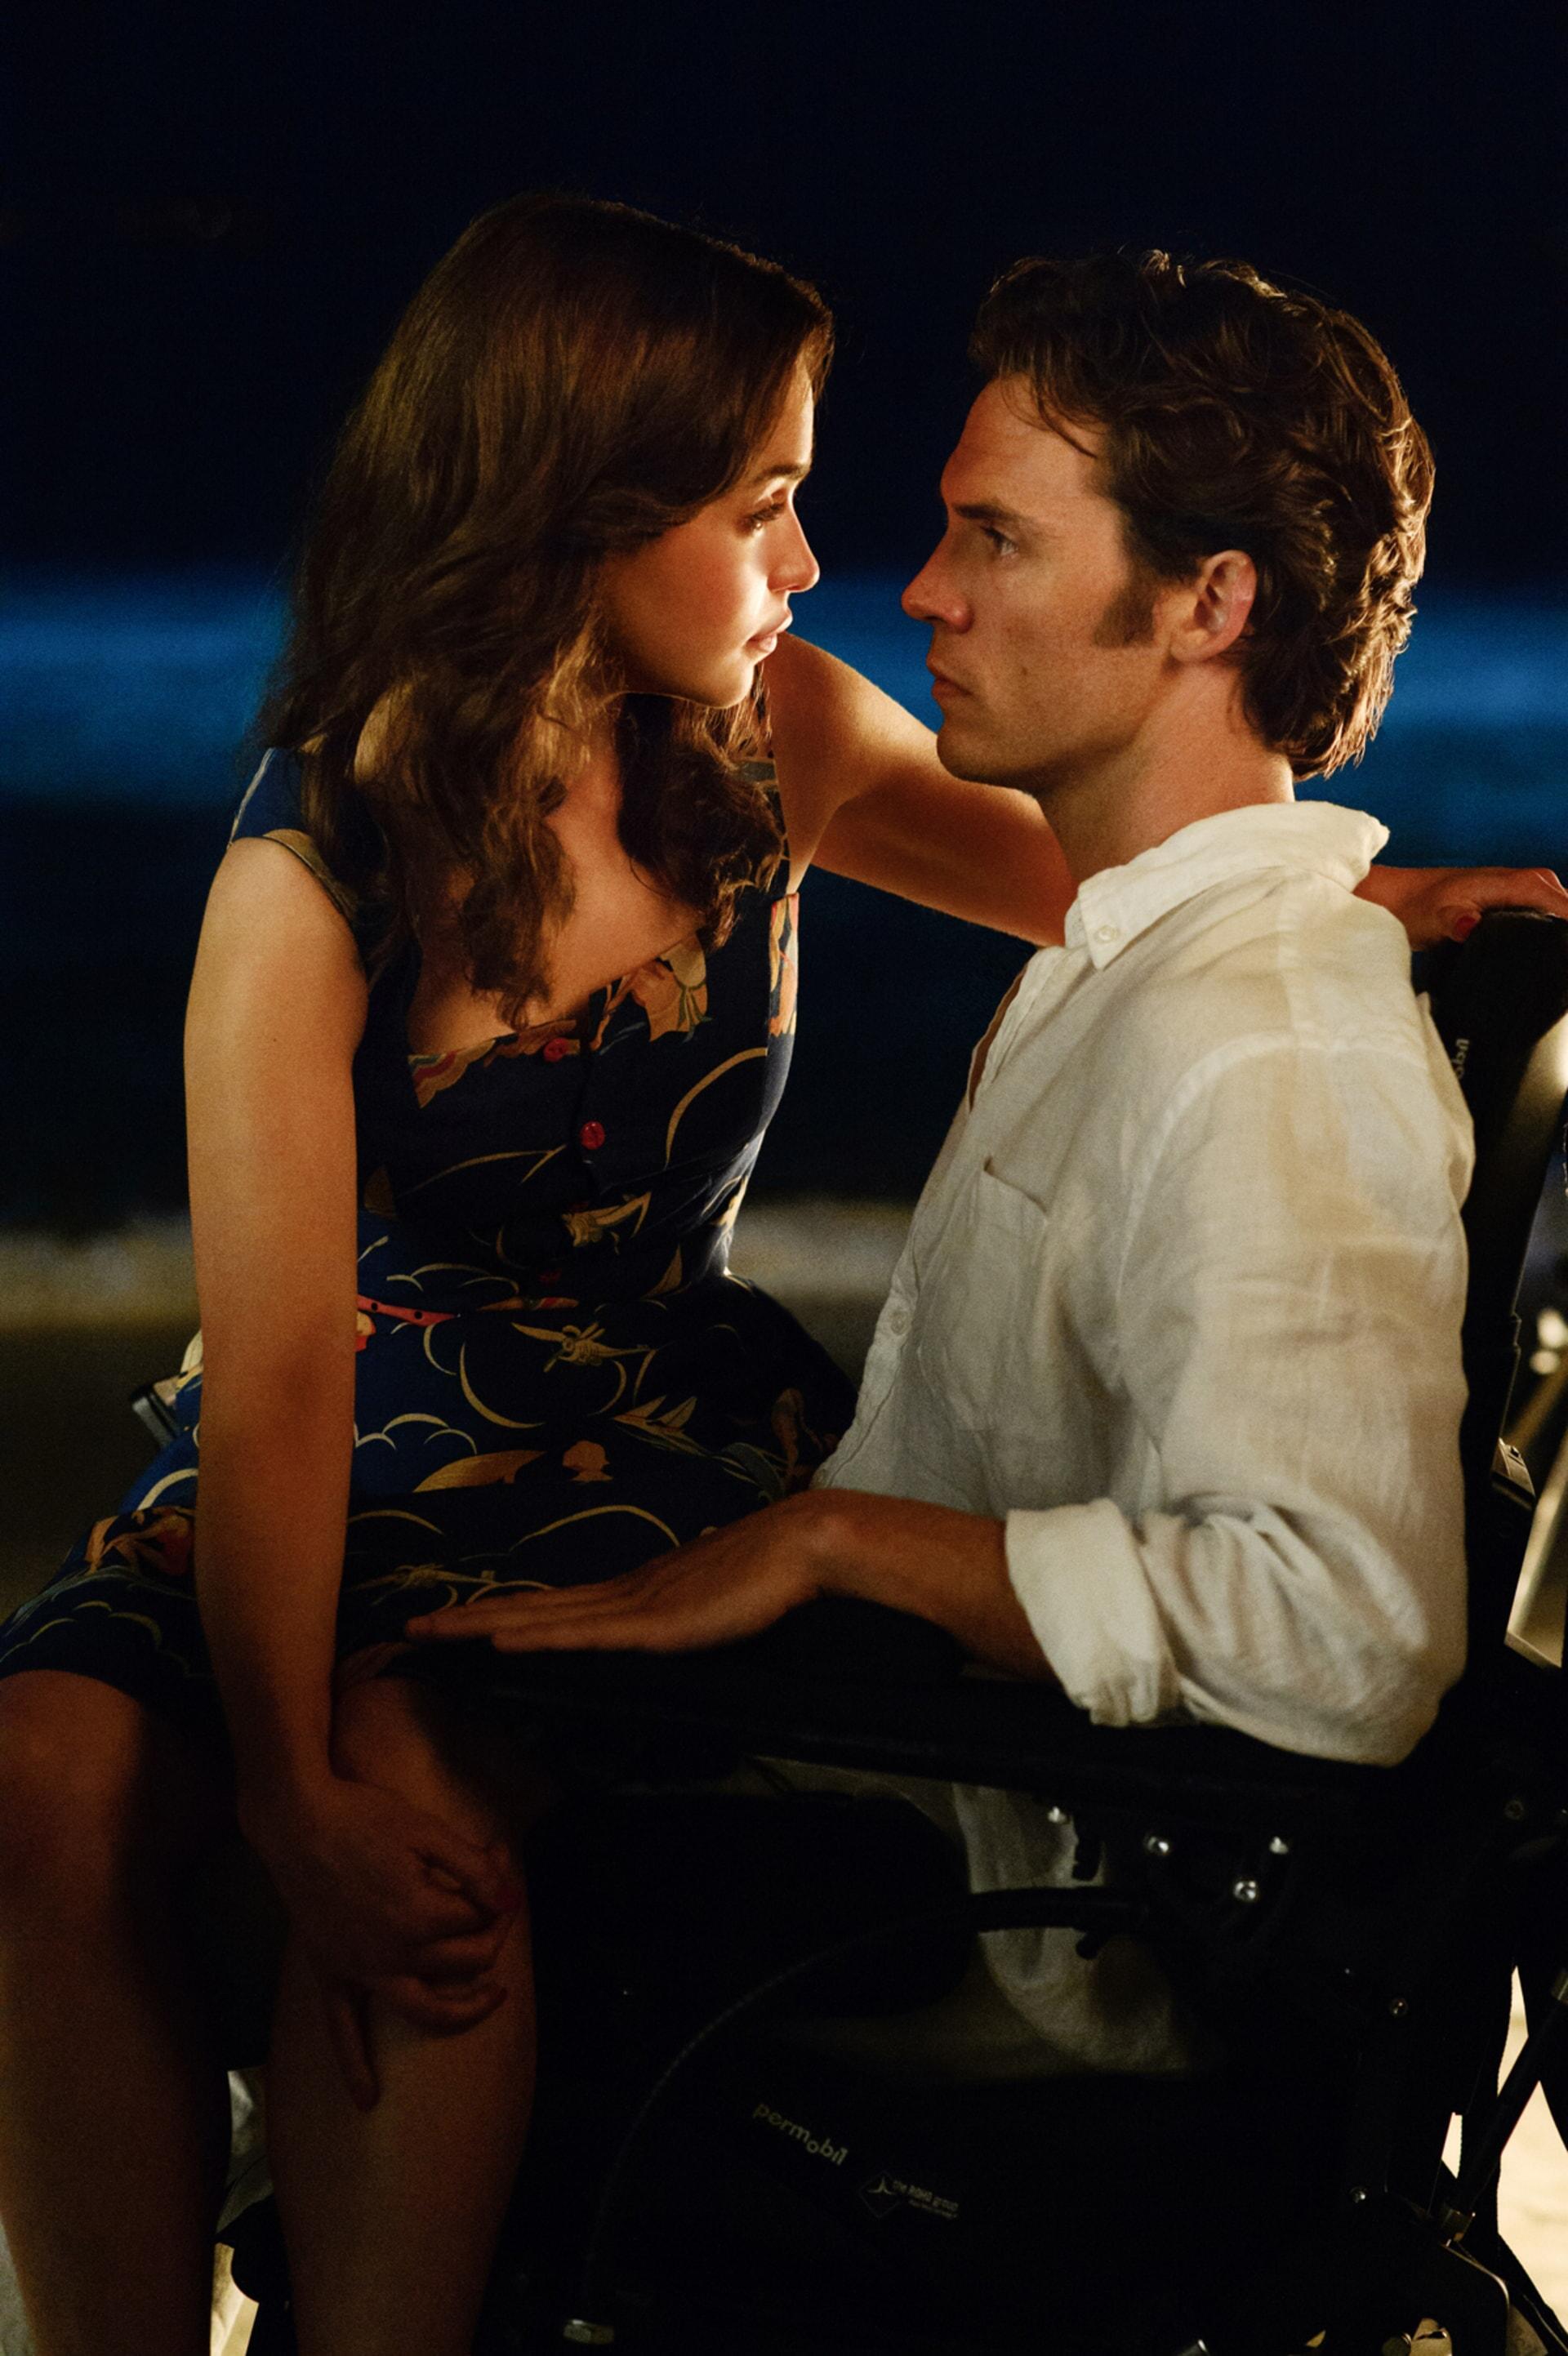 EMILIA CLARKE as Lou Clark sitting on the lap of SAM CLAFLIN as Will Traynor on a beach at nighttime.